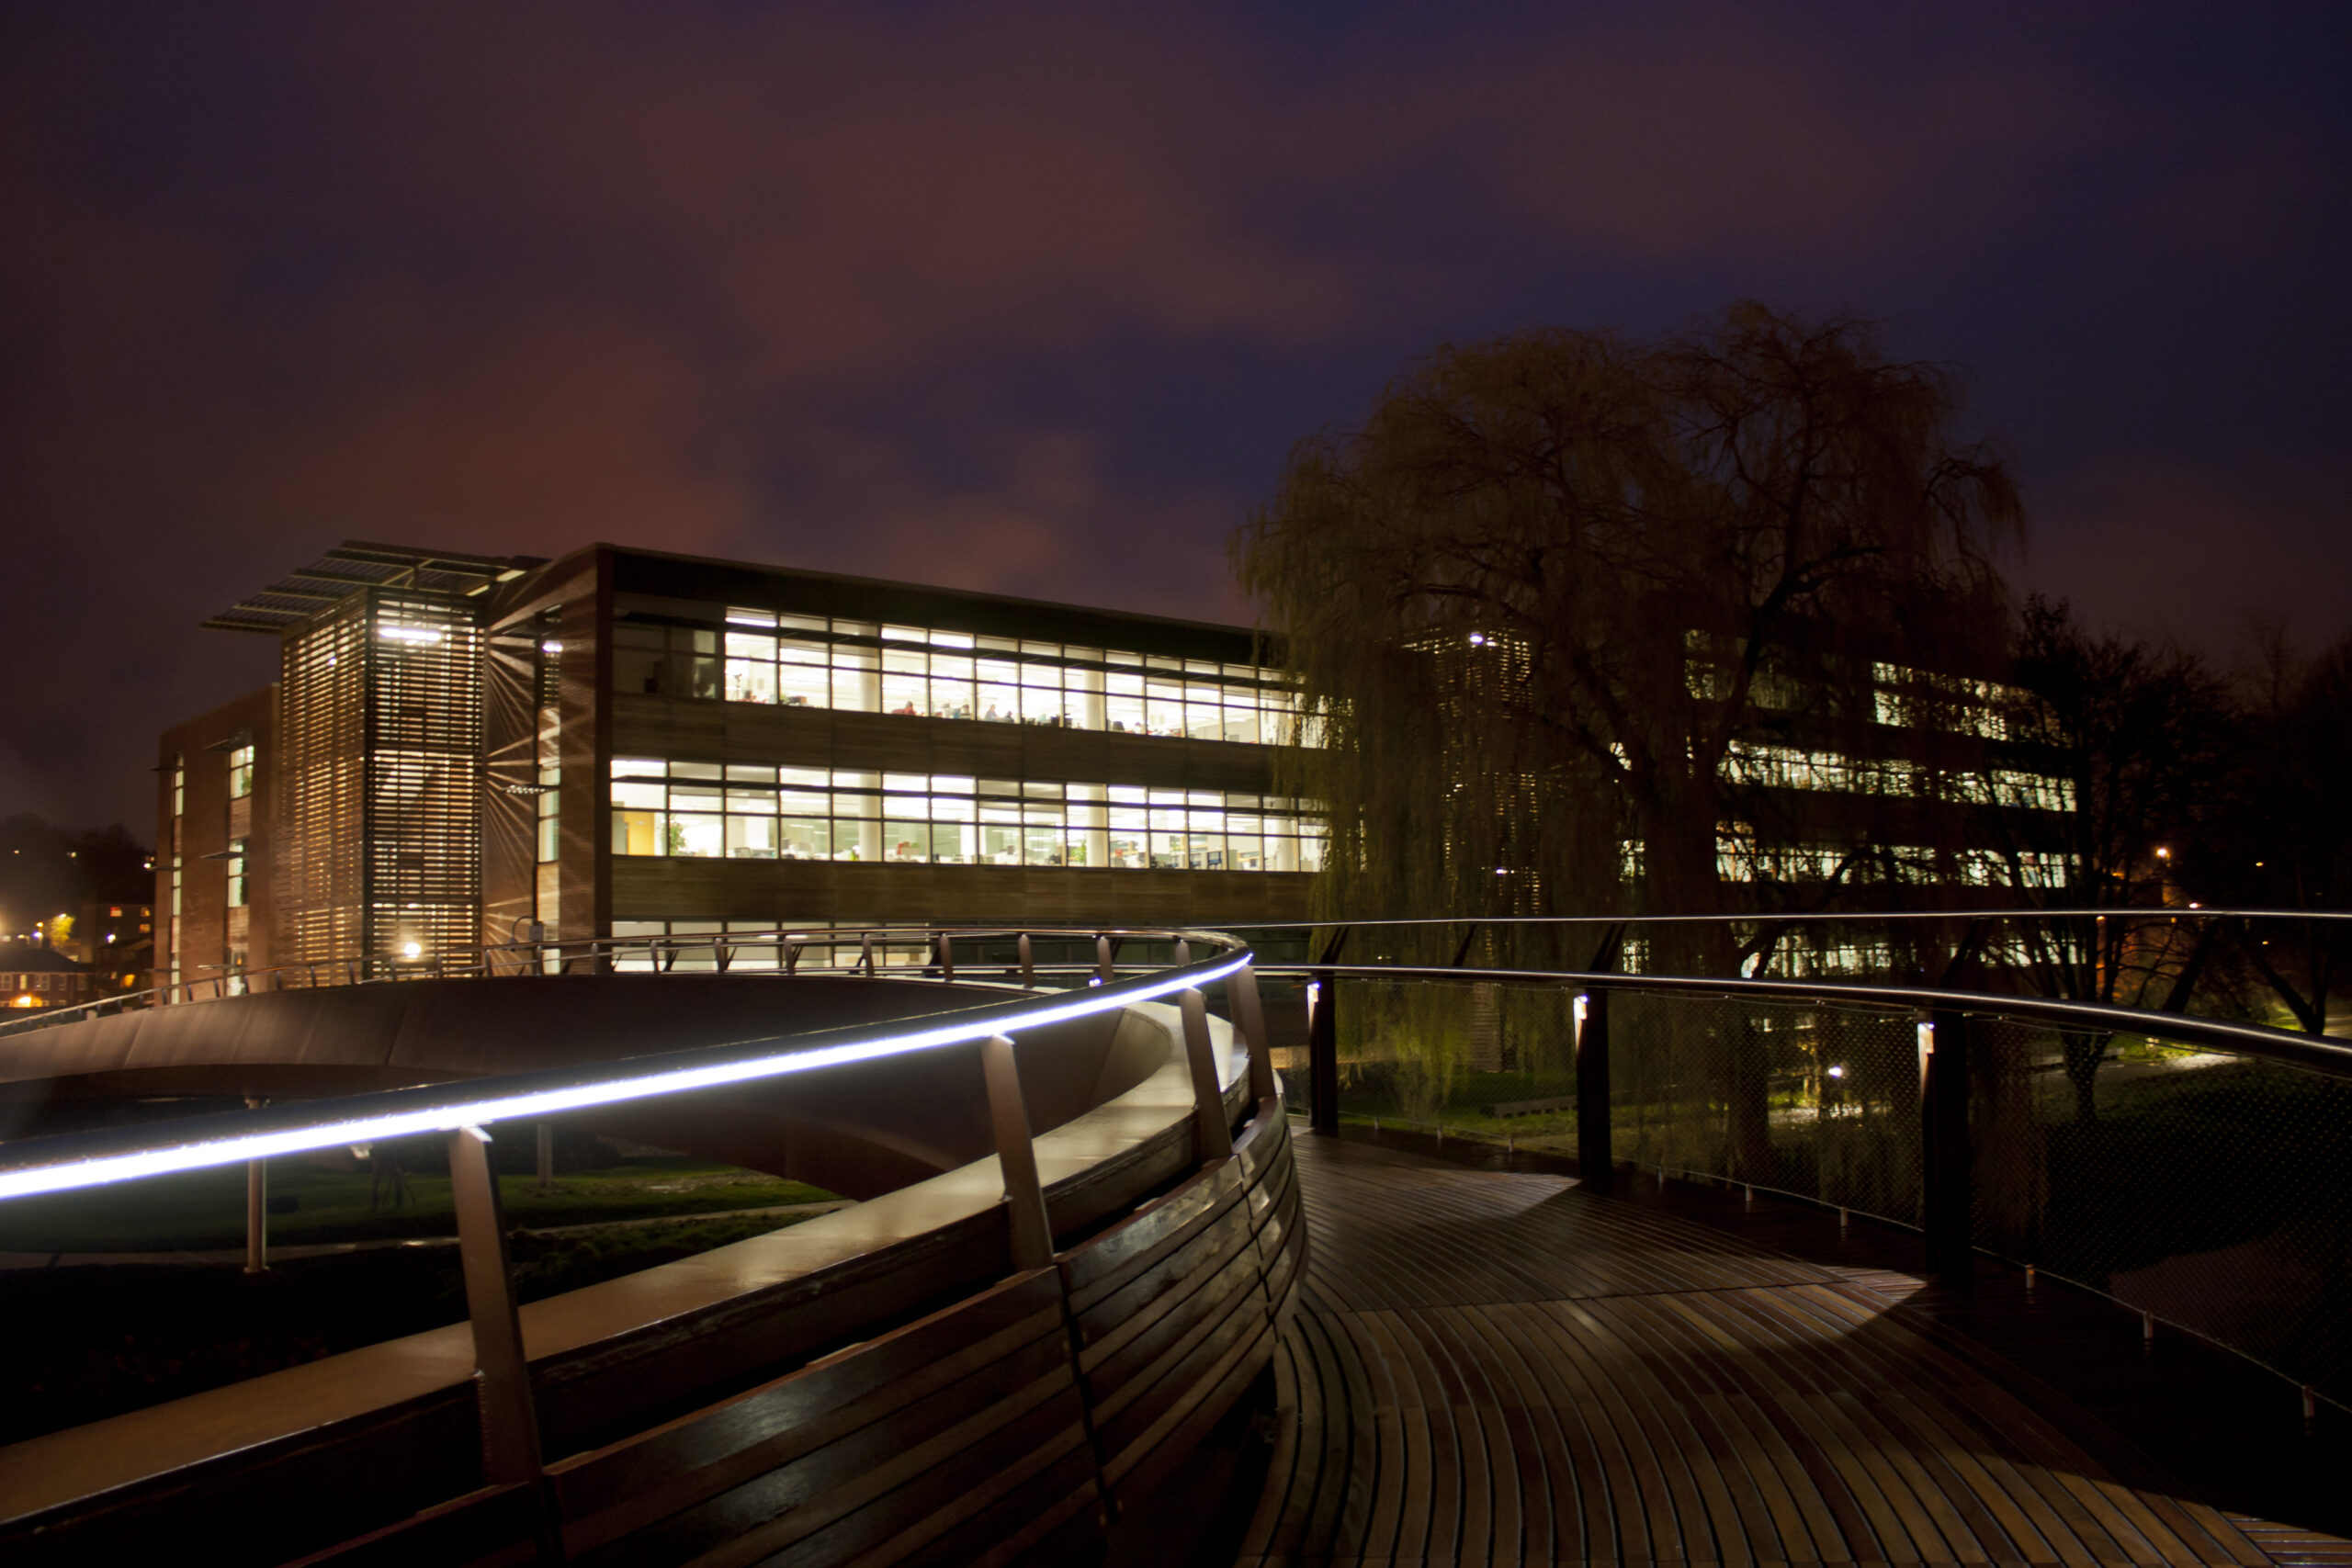 Jarrold Bridge Handrail - Architectural Lighting for Bridges & Walkways